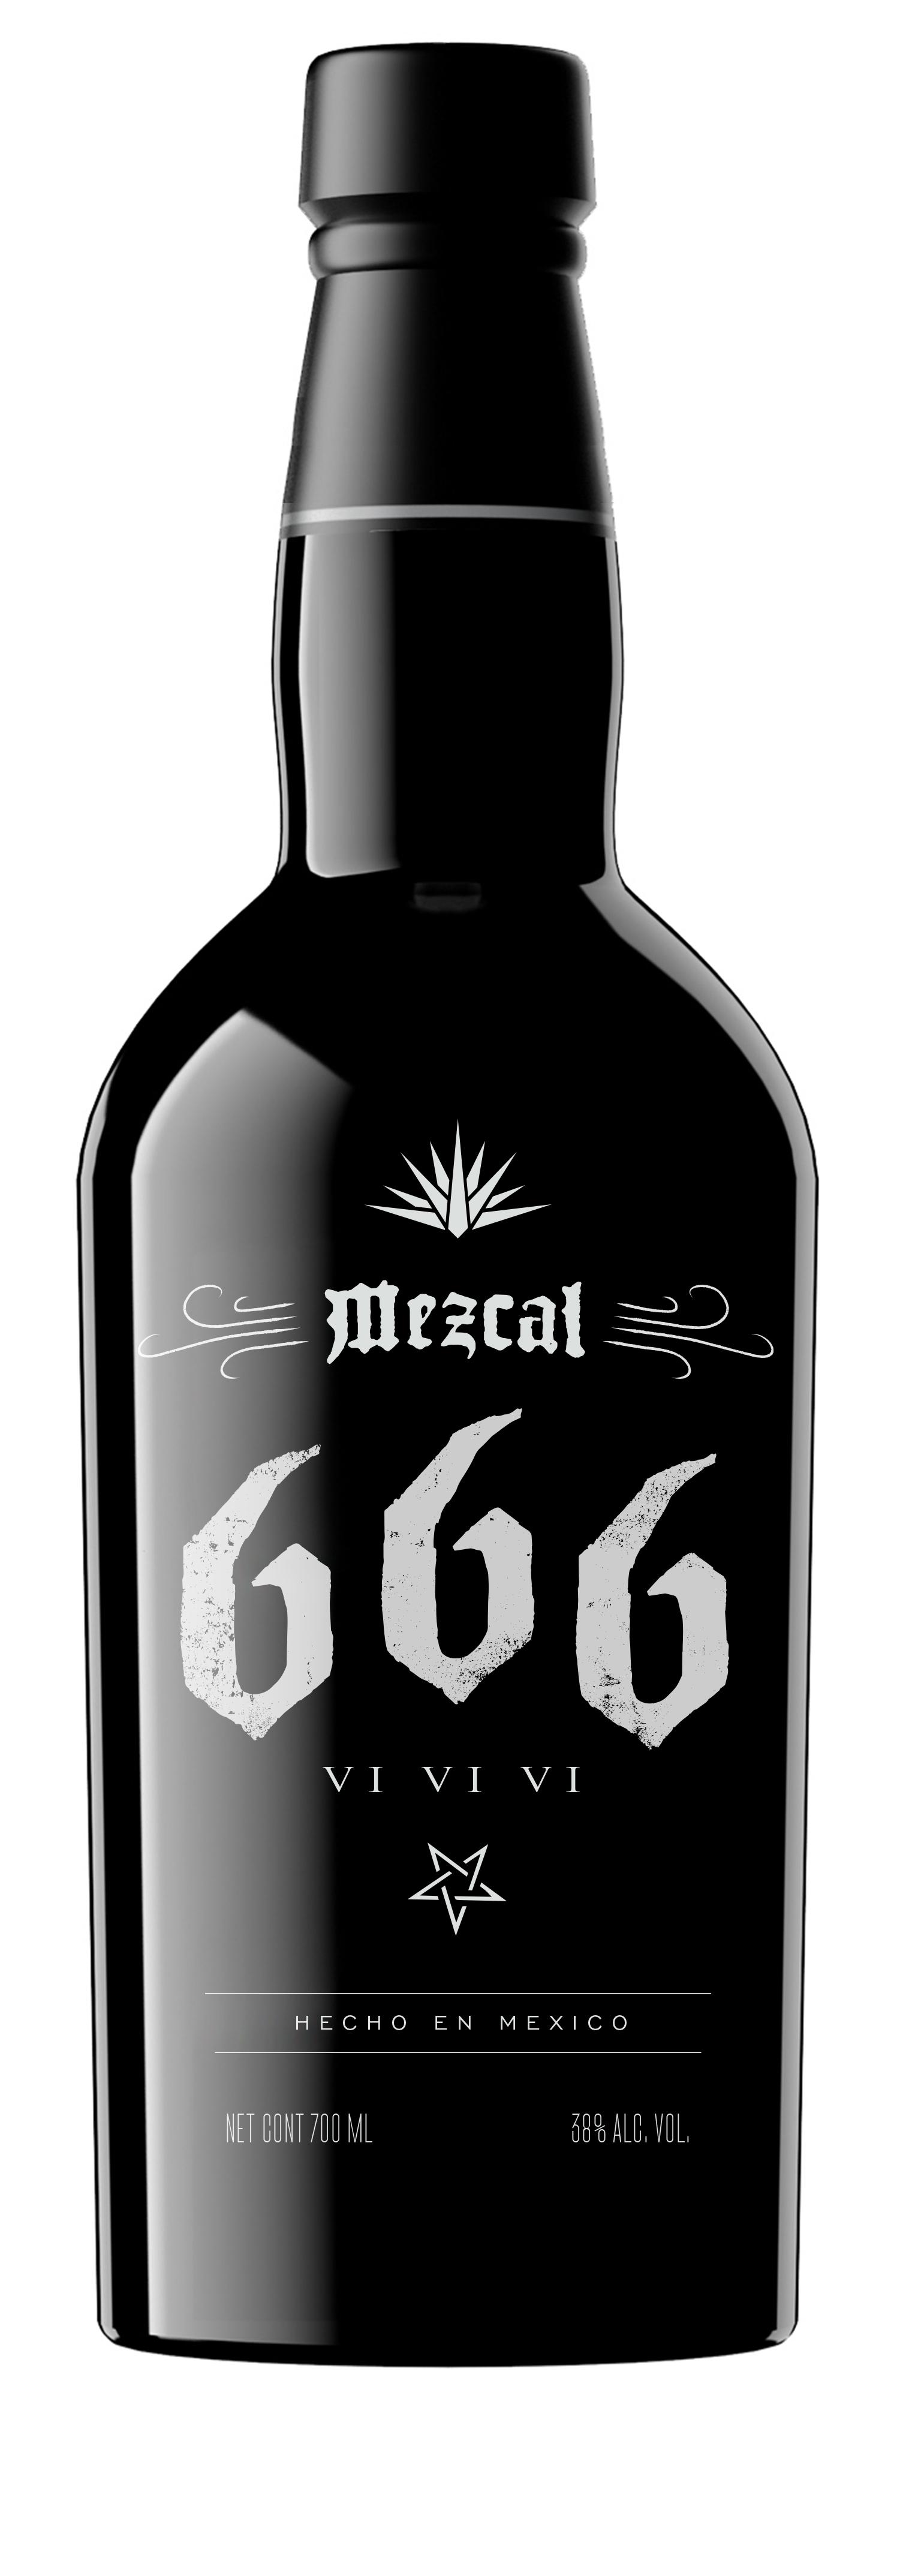 Mezcal 666 Black Bottles2 opt2_0007_666 distress.jpg